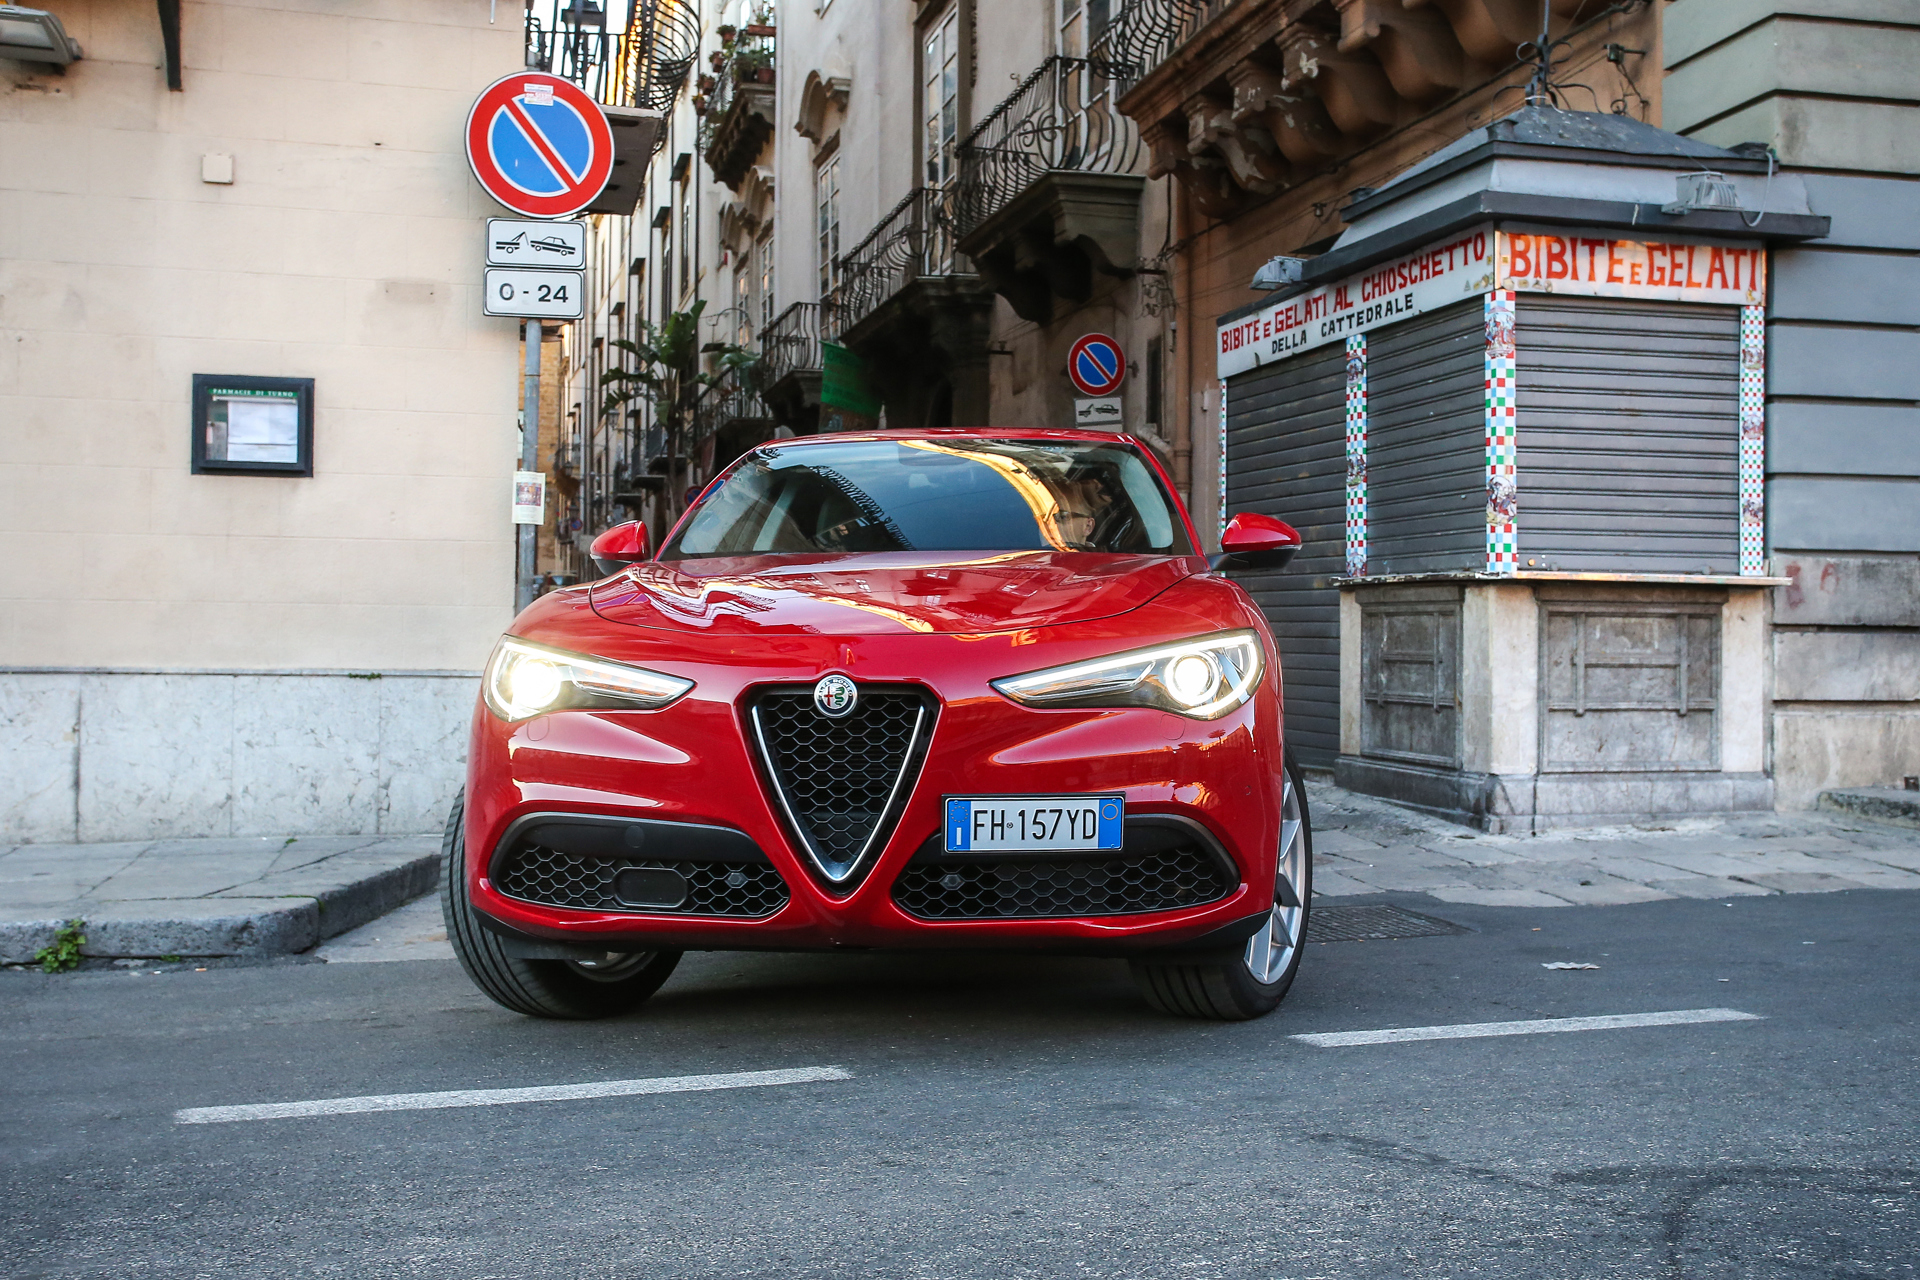 170420_Alfa-Romeo_Gastronomia_01-kopi.jpg